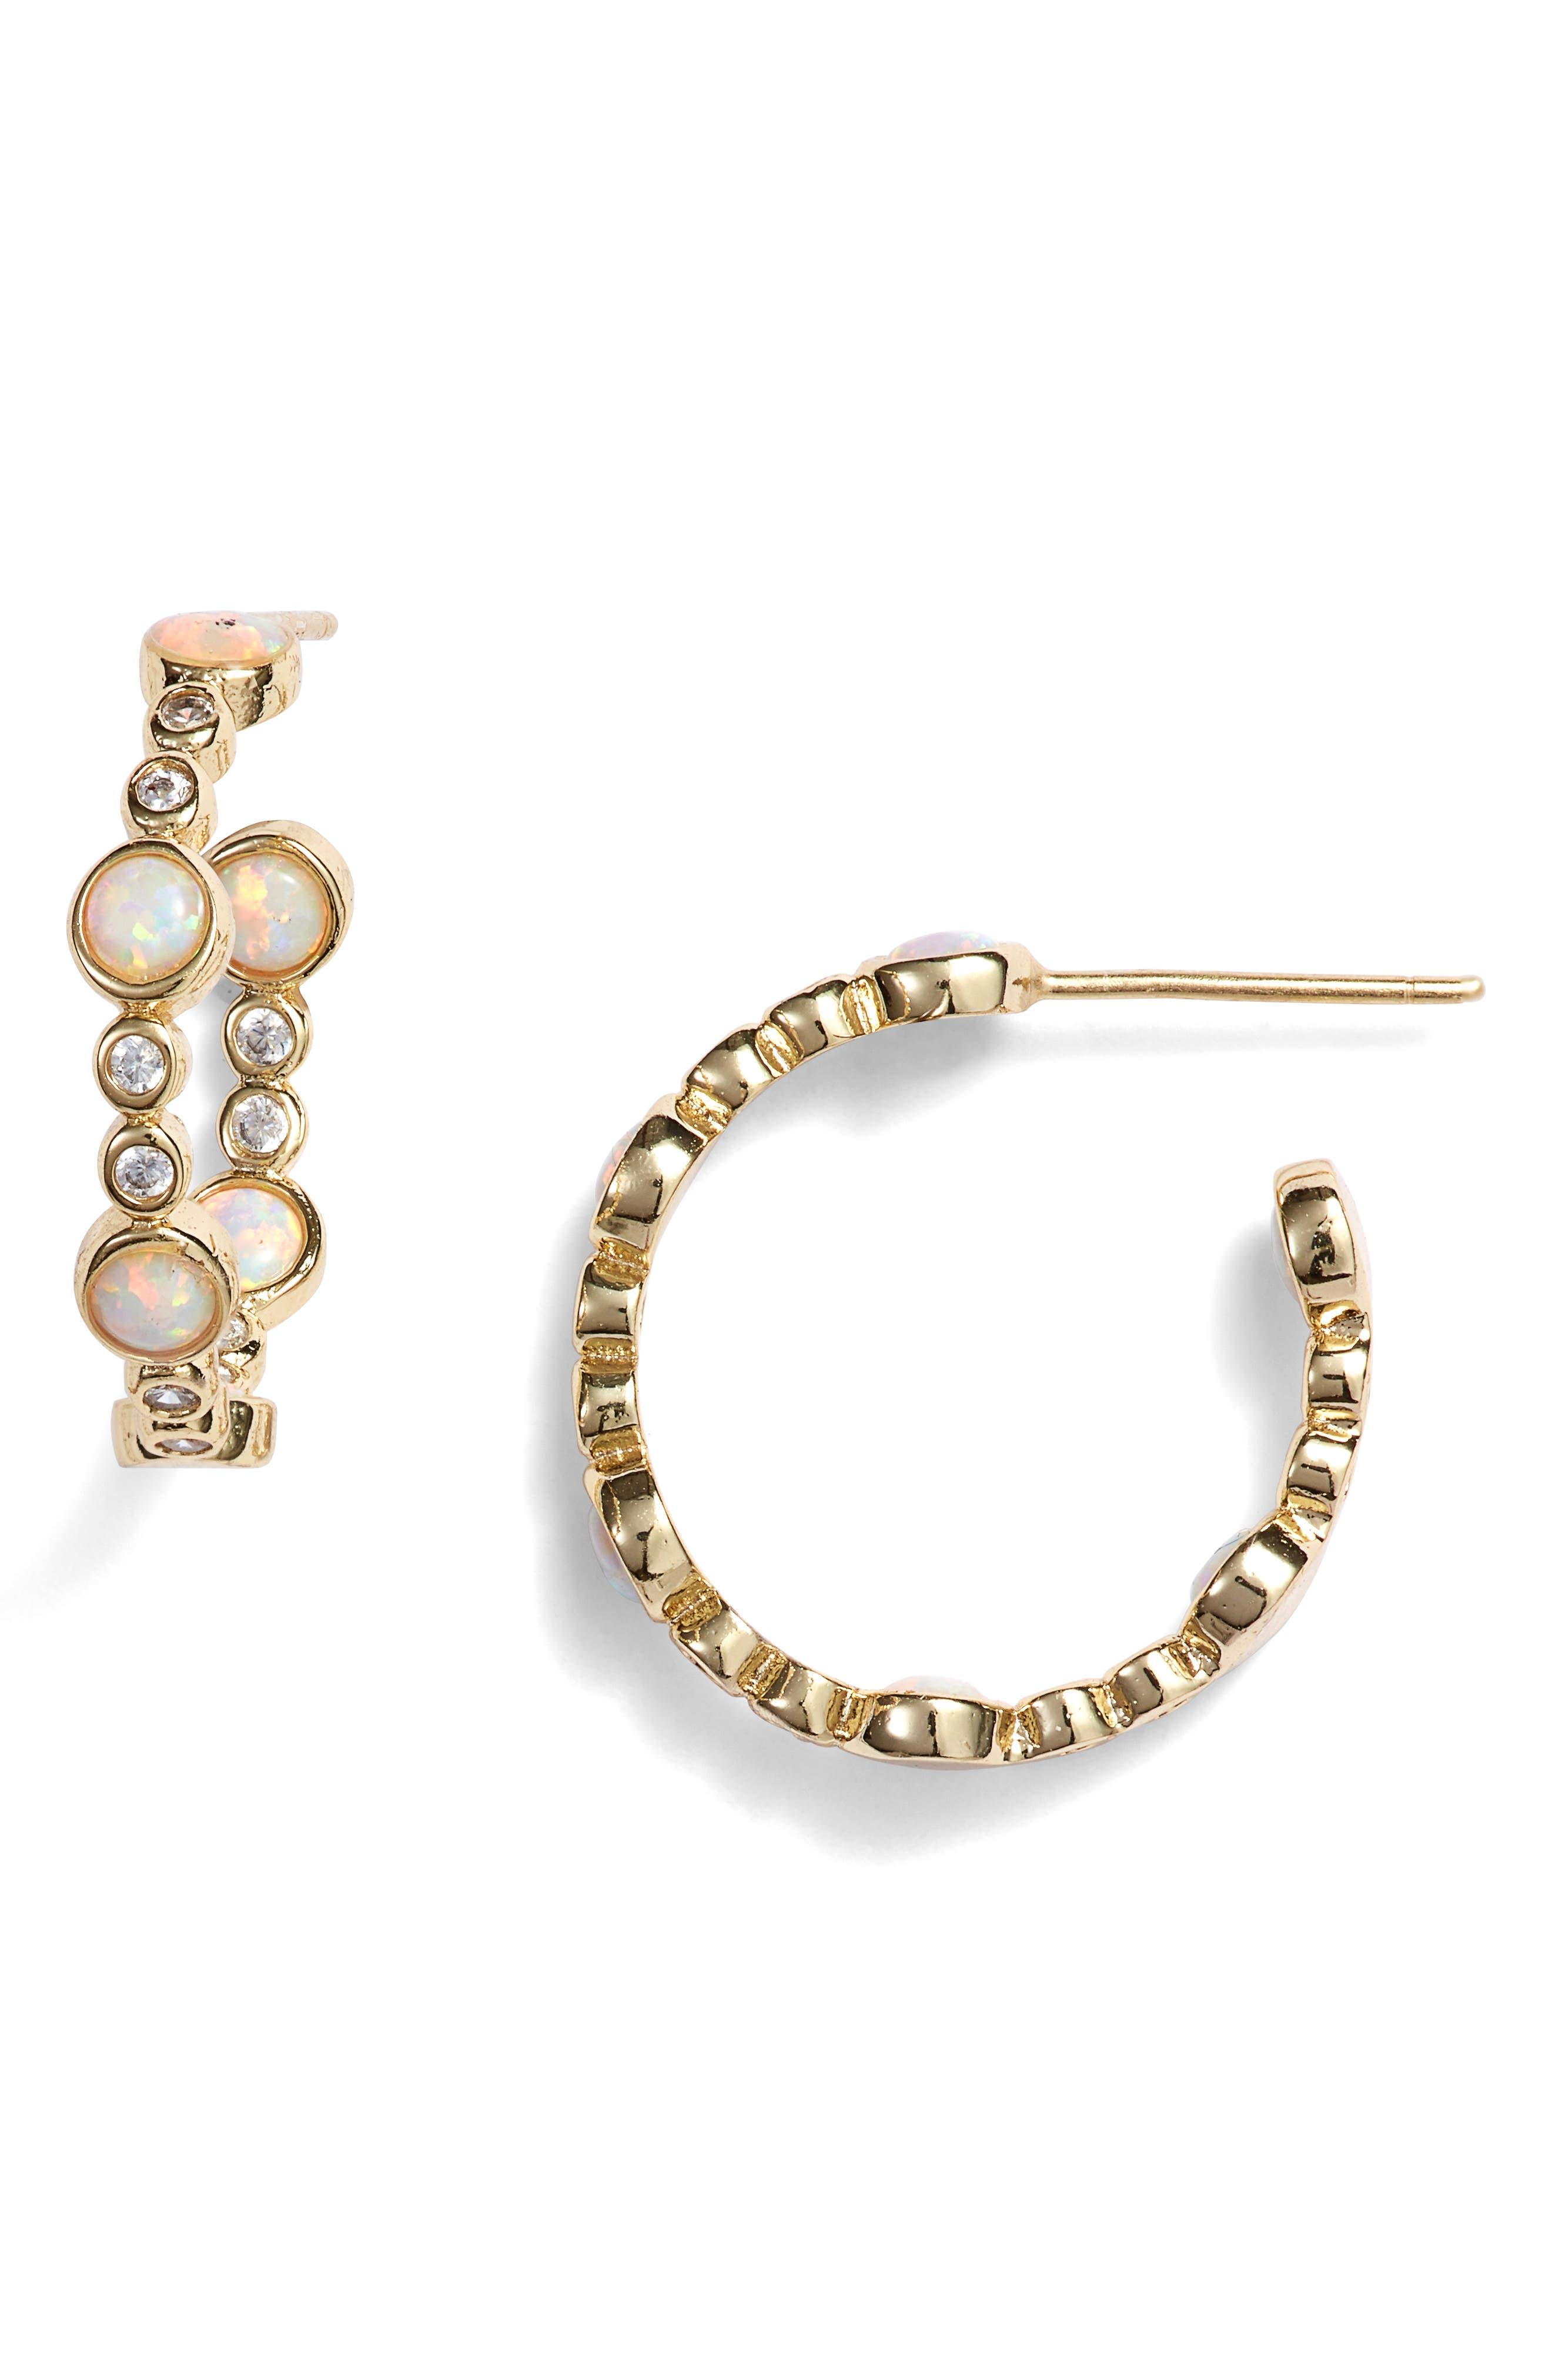 MELINDA MARIA Allison Hoop Earrings in White Opal/ Clear/ Gold